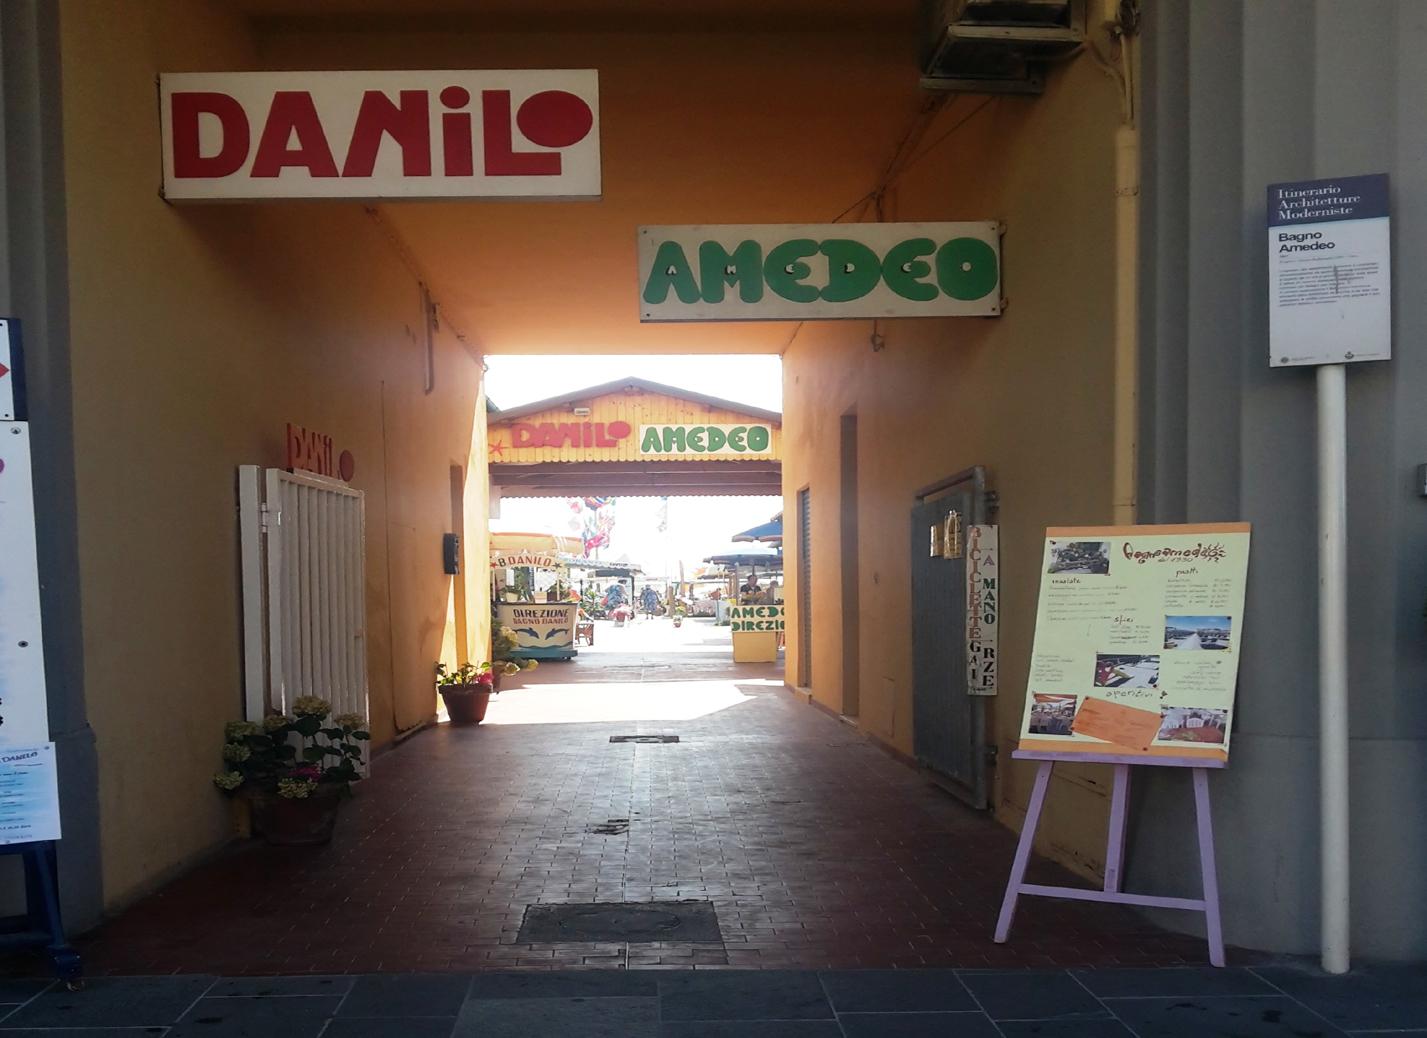 Bagno Amedeo